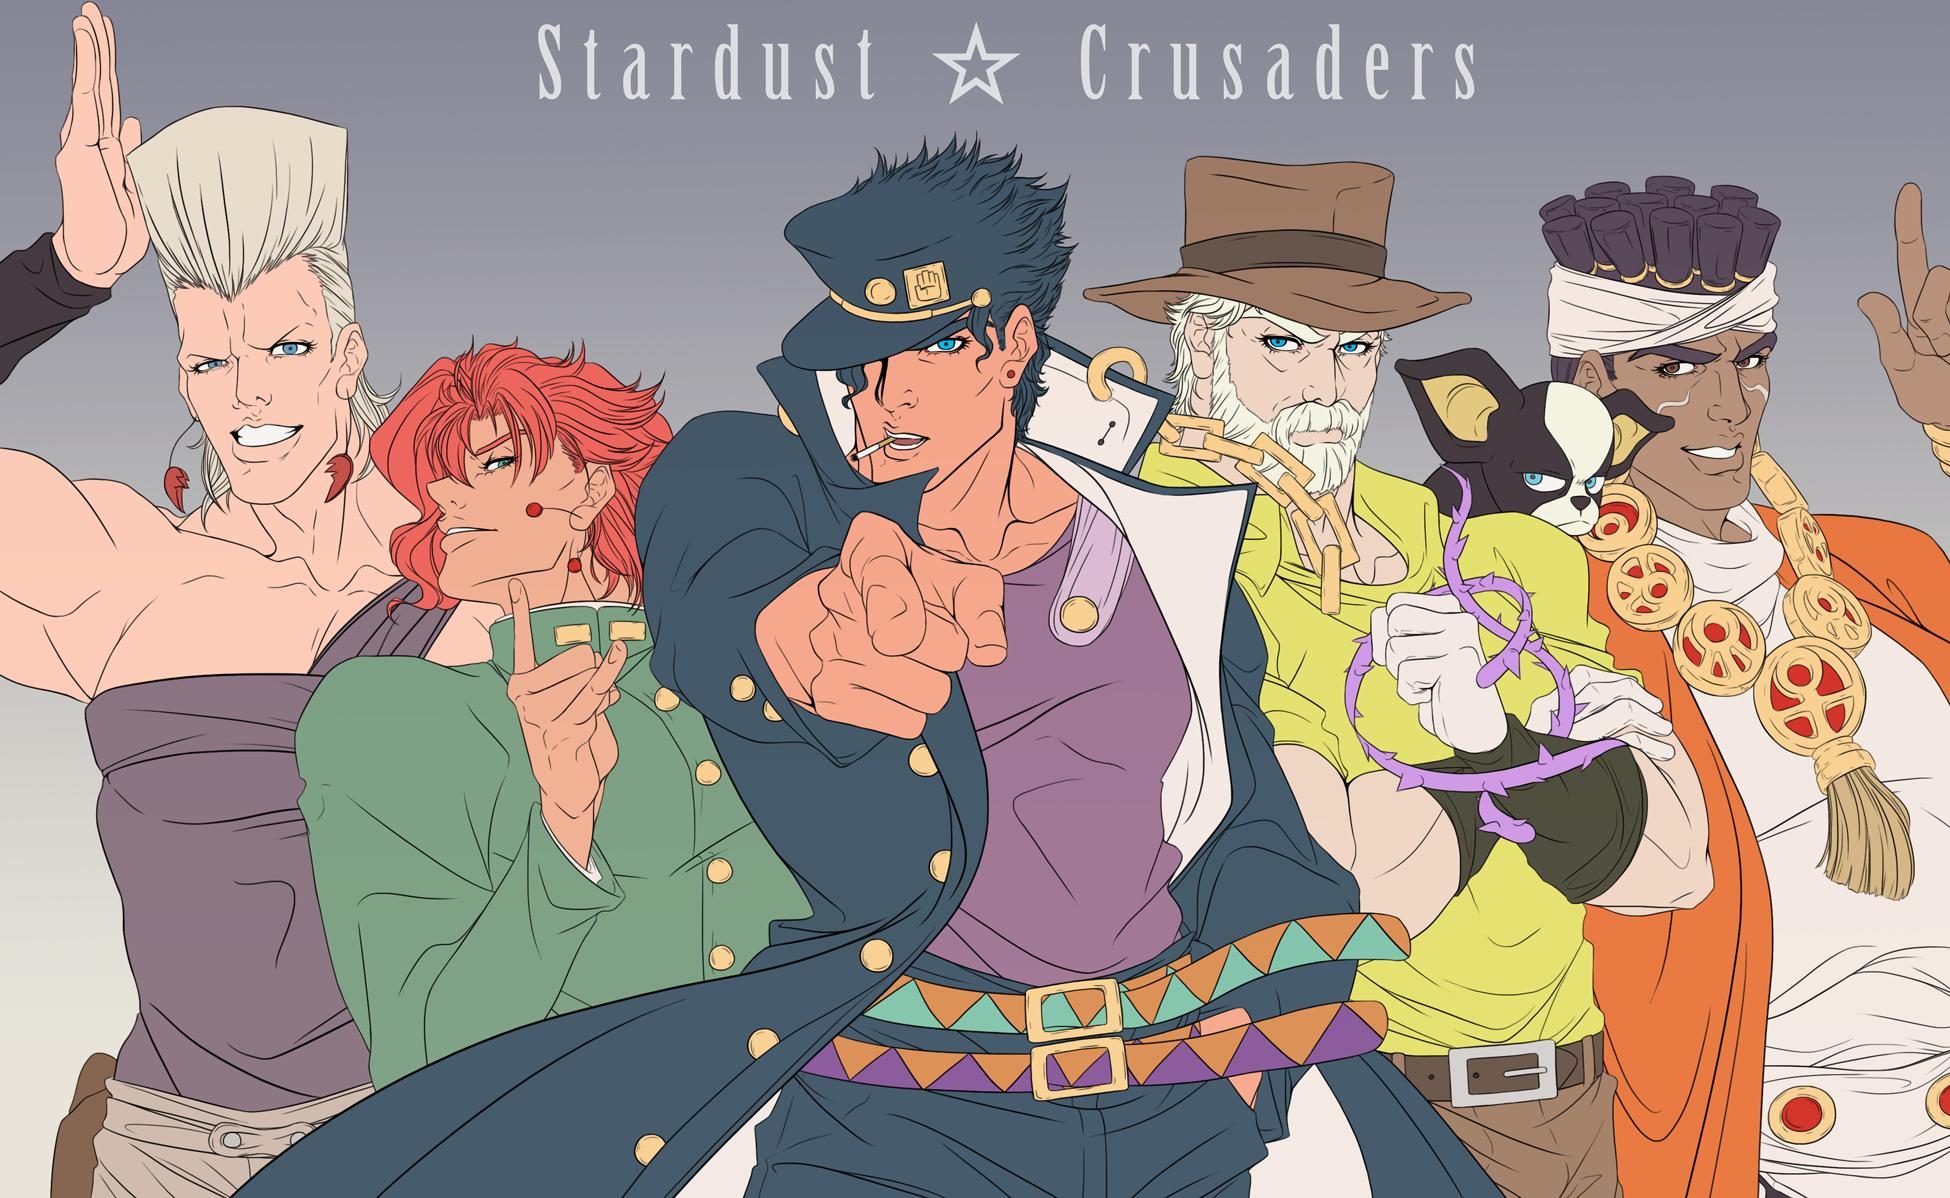 jjba stardust crusaders ending a relationship